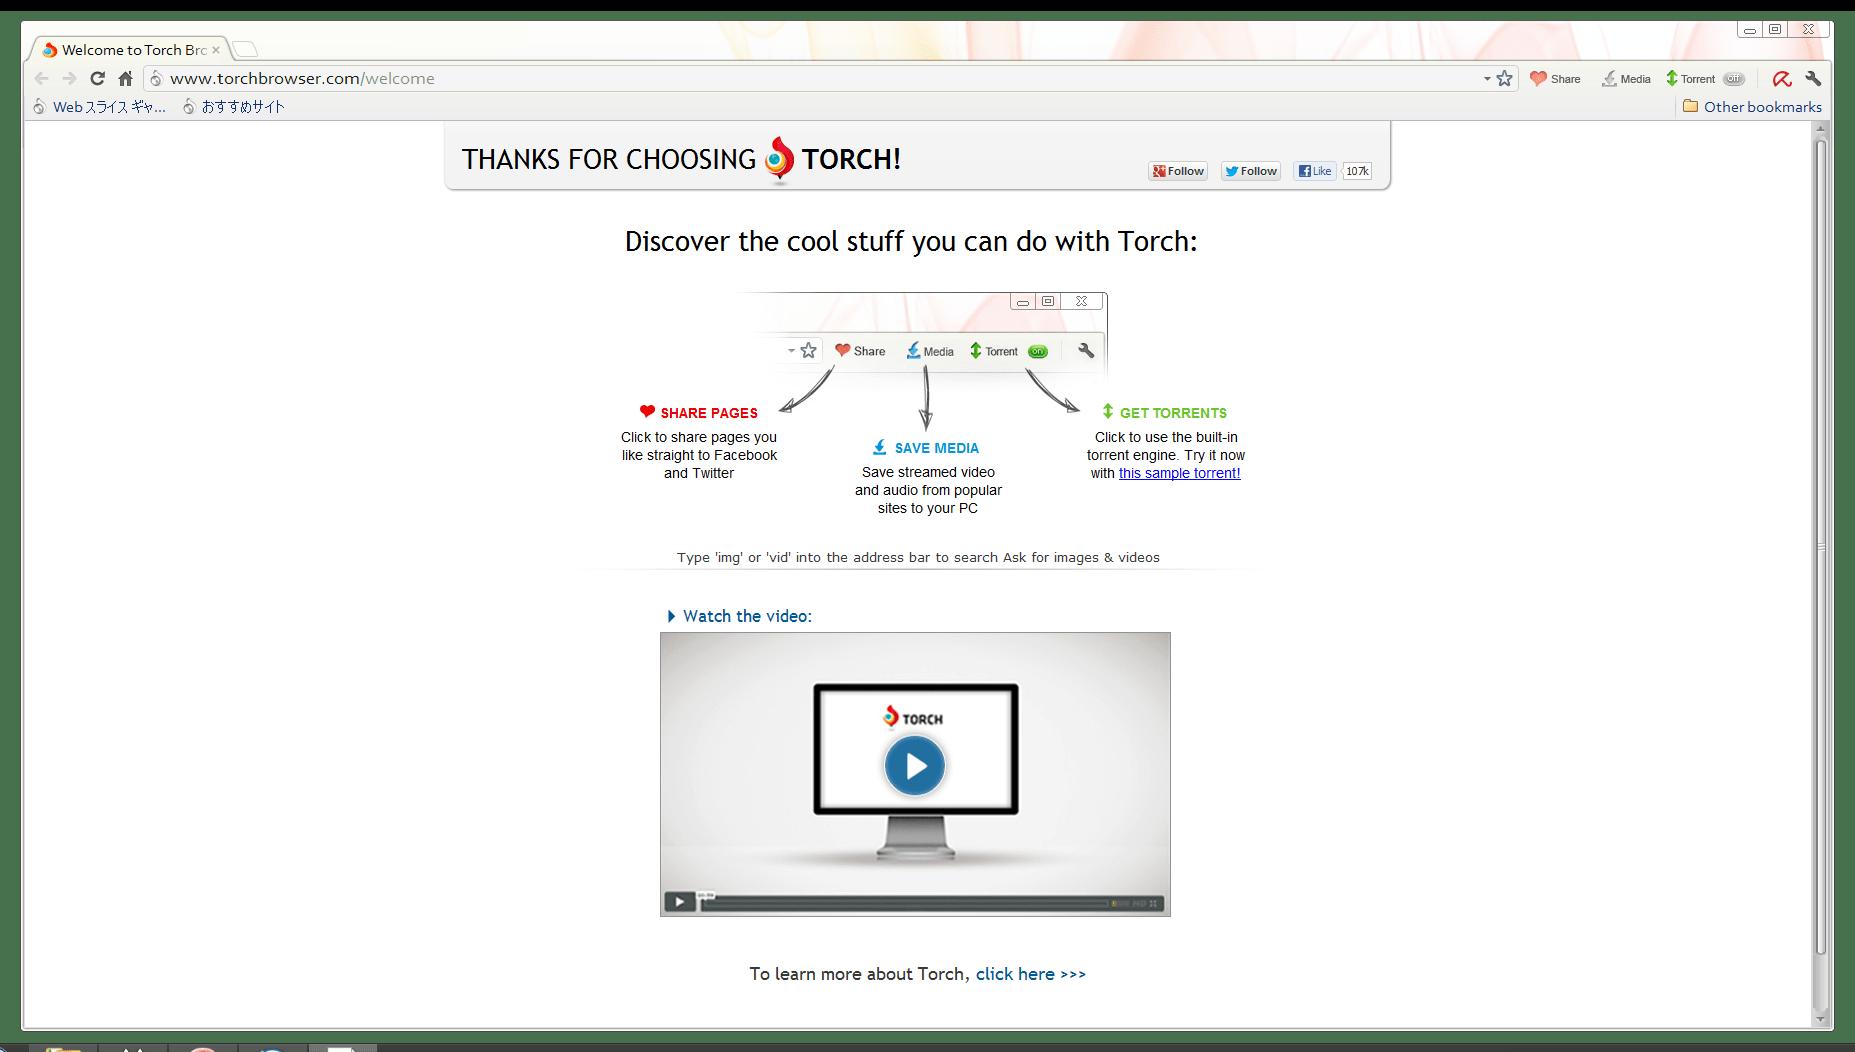 Google Chromeをベースにした軽快タブブラウザ「Torch Browser